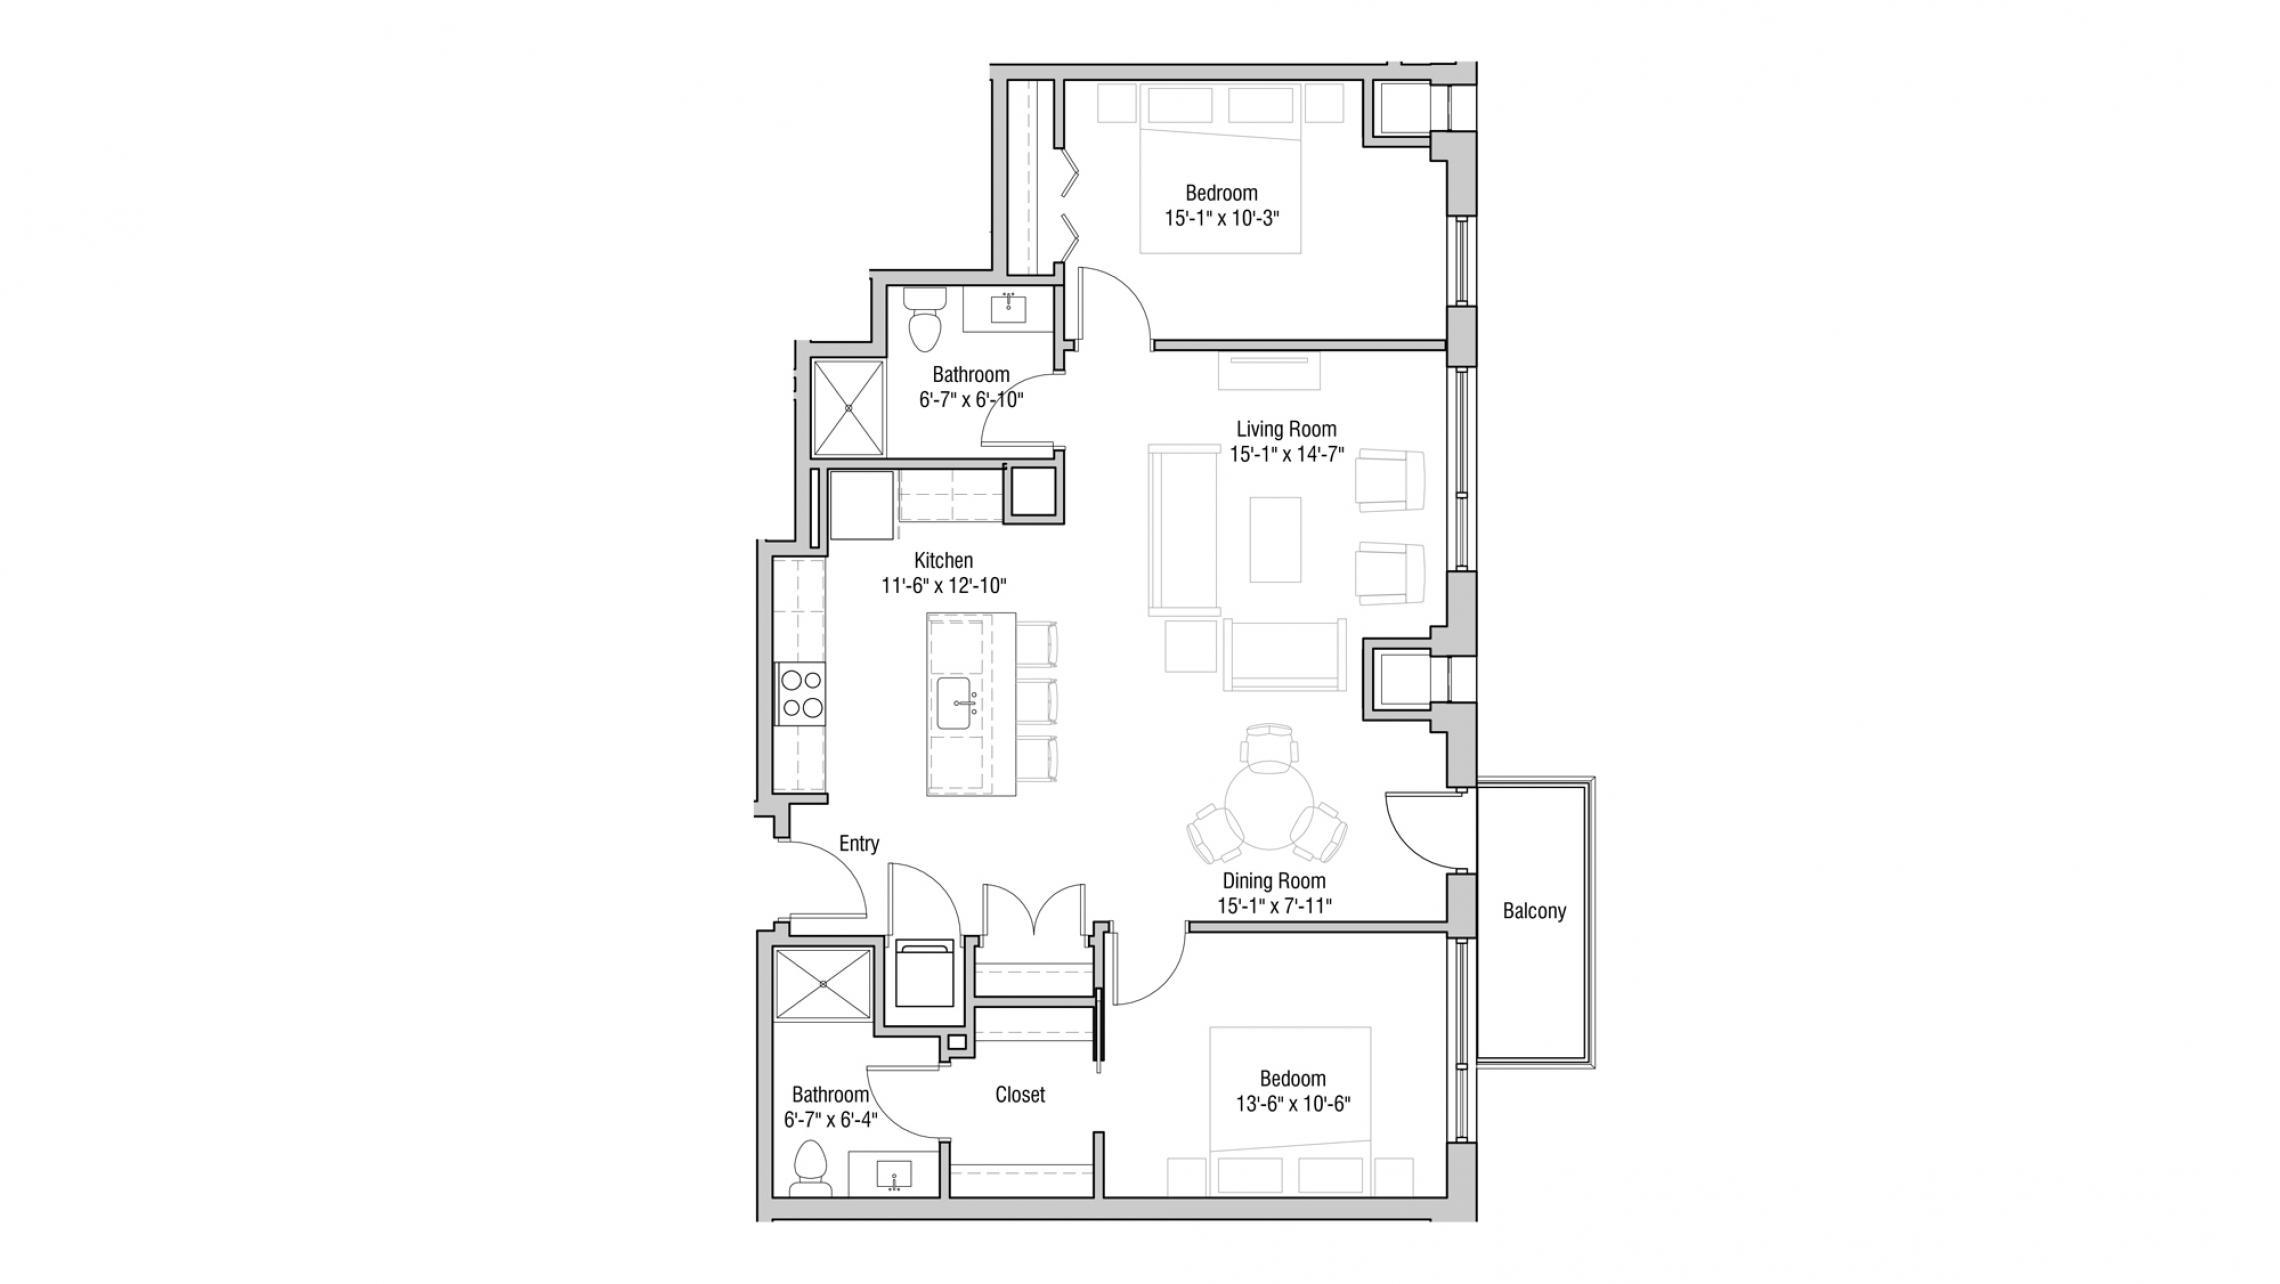 ULI Quarter Row 111 - Two Bedroom, Two Bathroom